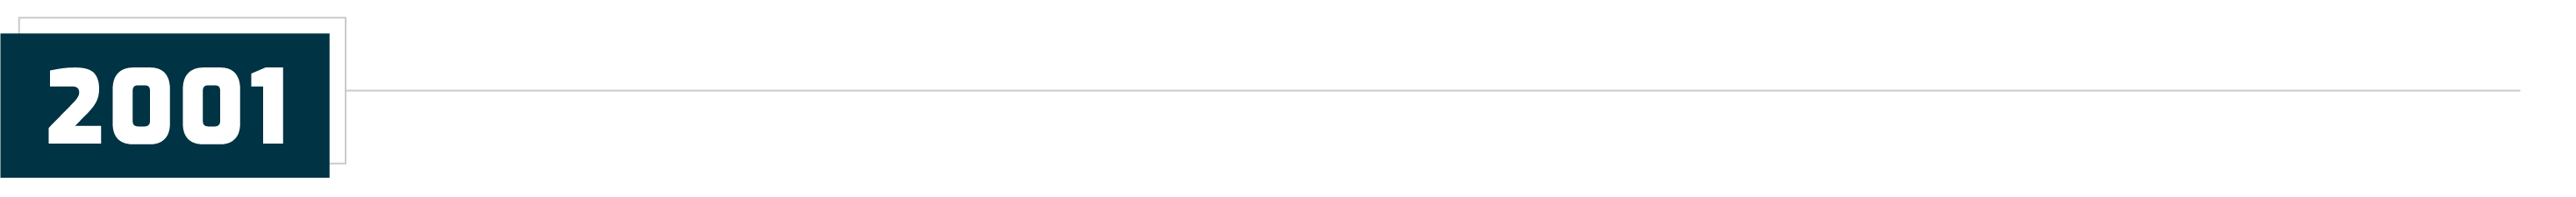 Choice Bank Timeline 2001